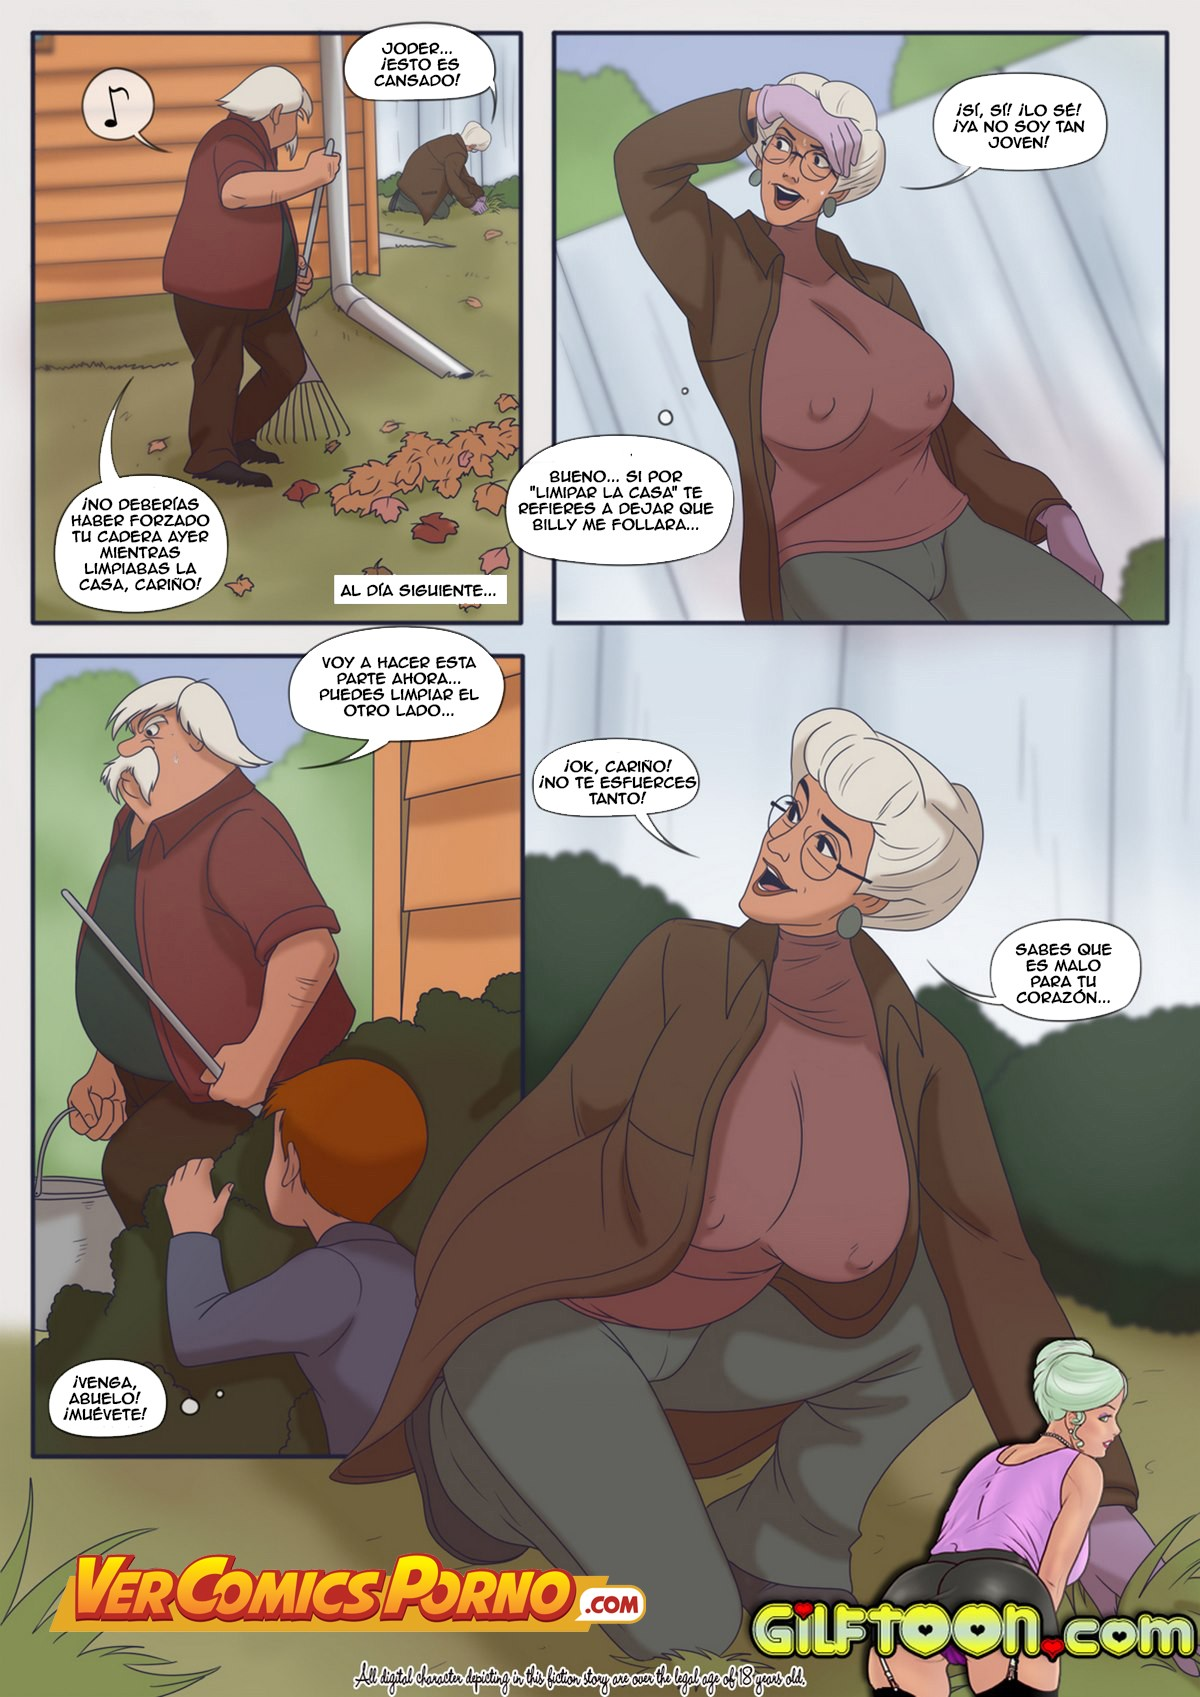 Nieto follando con abuela en secreto